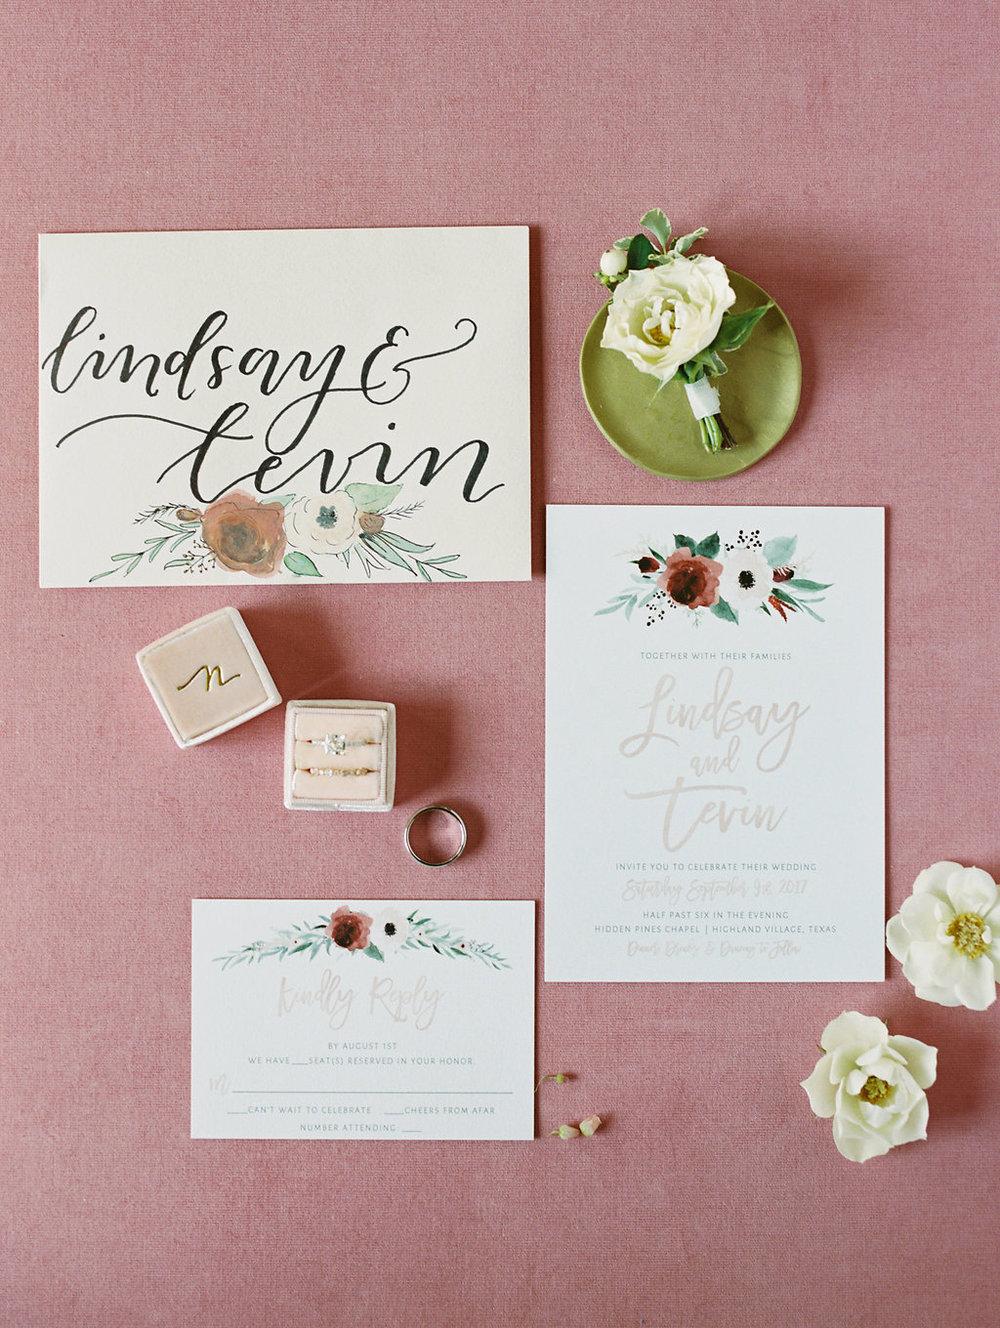 Floral Design Wedding Invitations - Dallas Wedding Planner